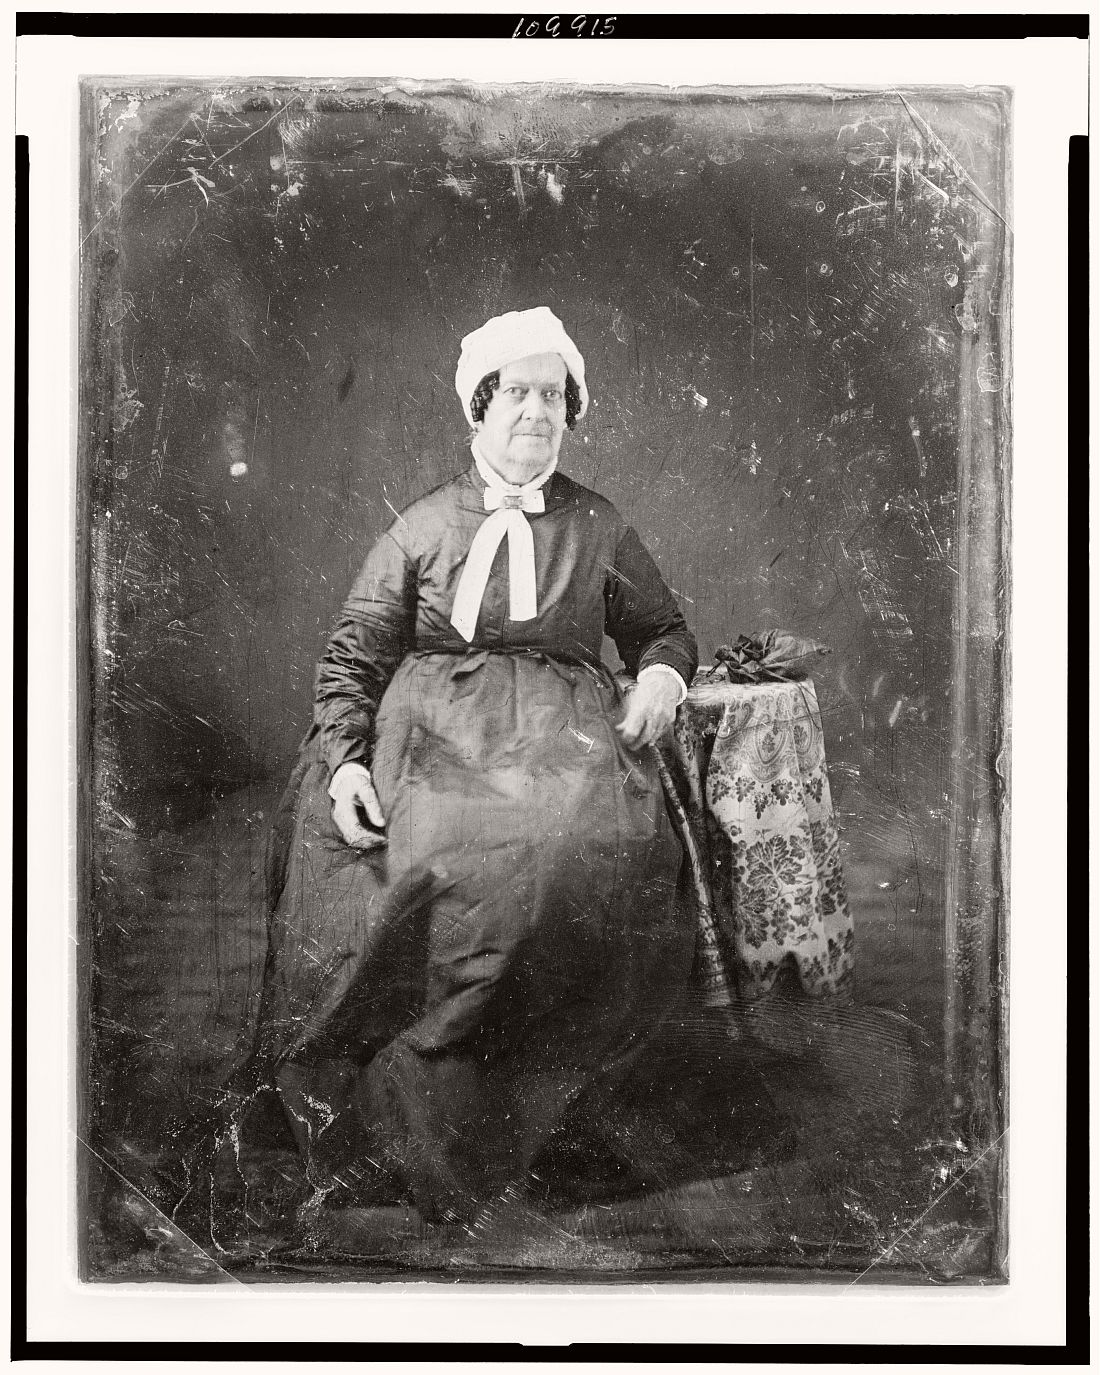 vintage-daguerreotype-portraits-from-xix-century-1844-1860-22